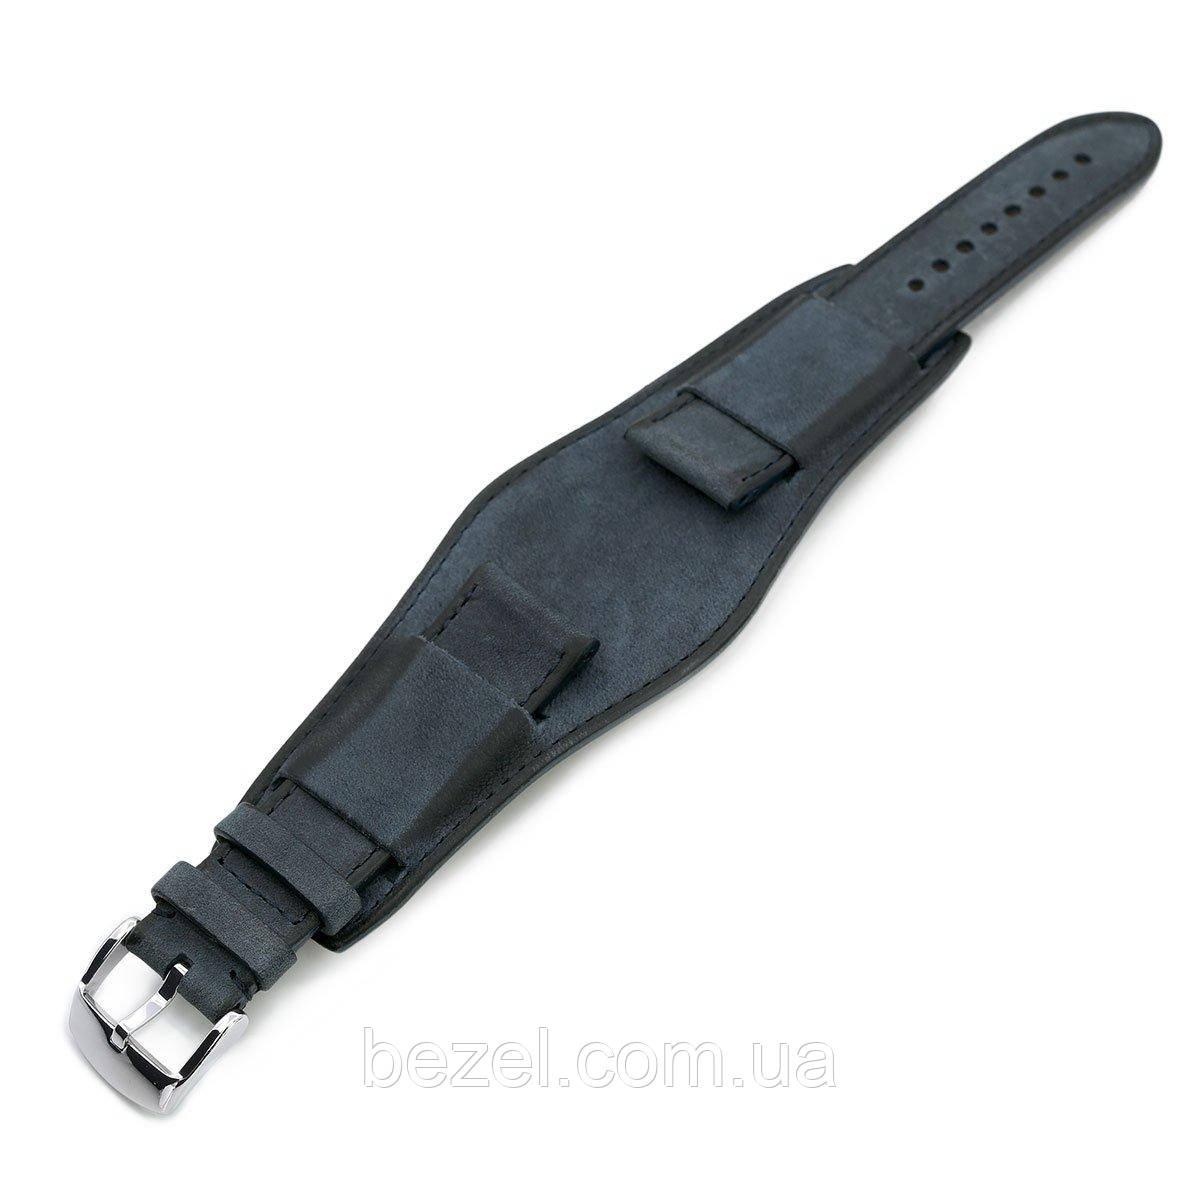 22mm Italian Handmade Bund Military Style Double-layer Watch Strap, Navy Blue